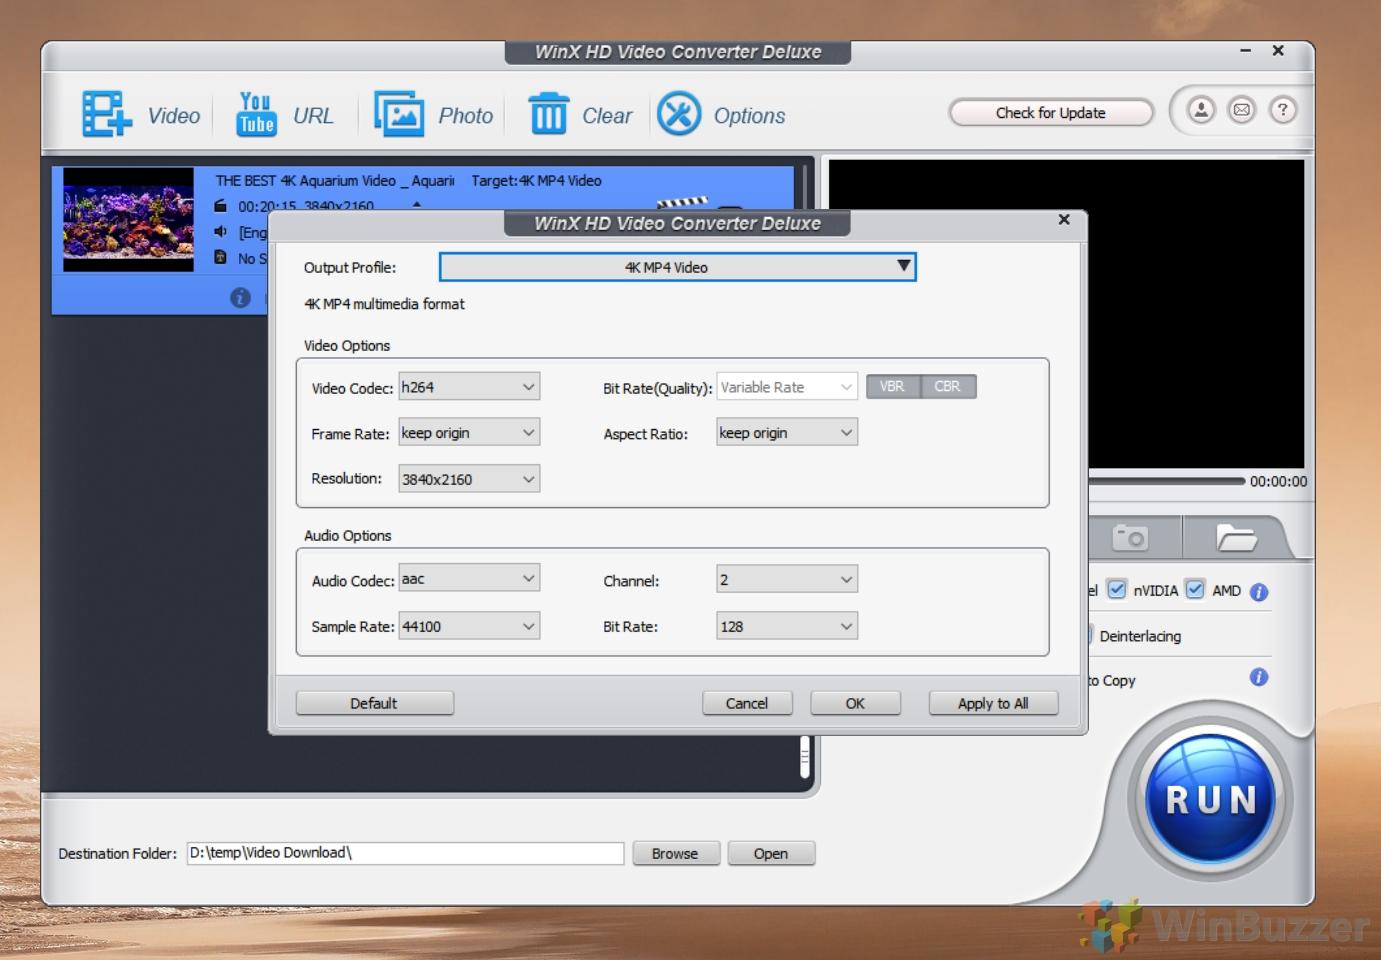 WinX Video Converter - Output Profile